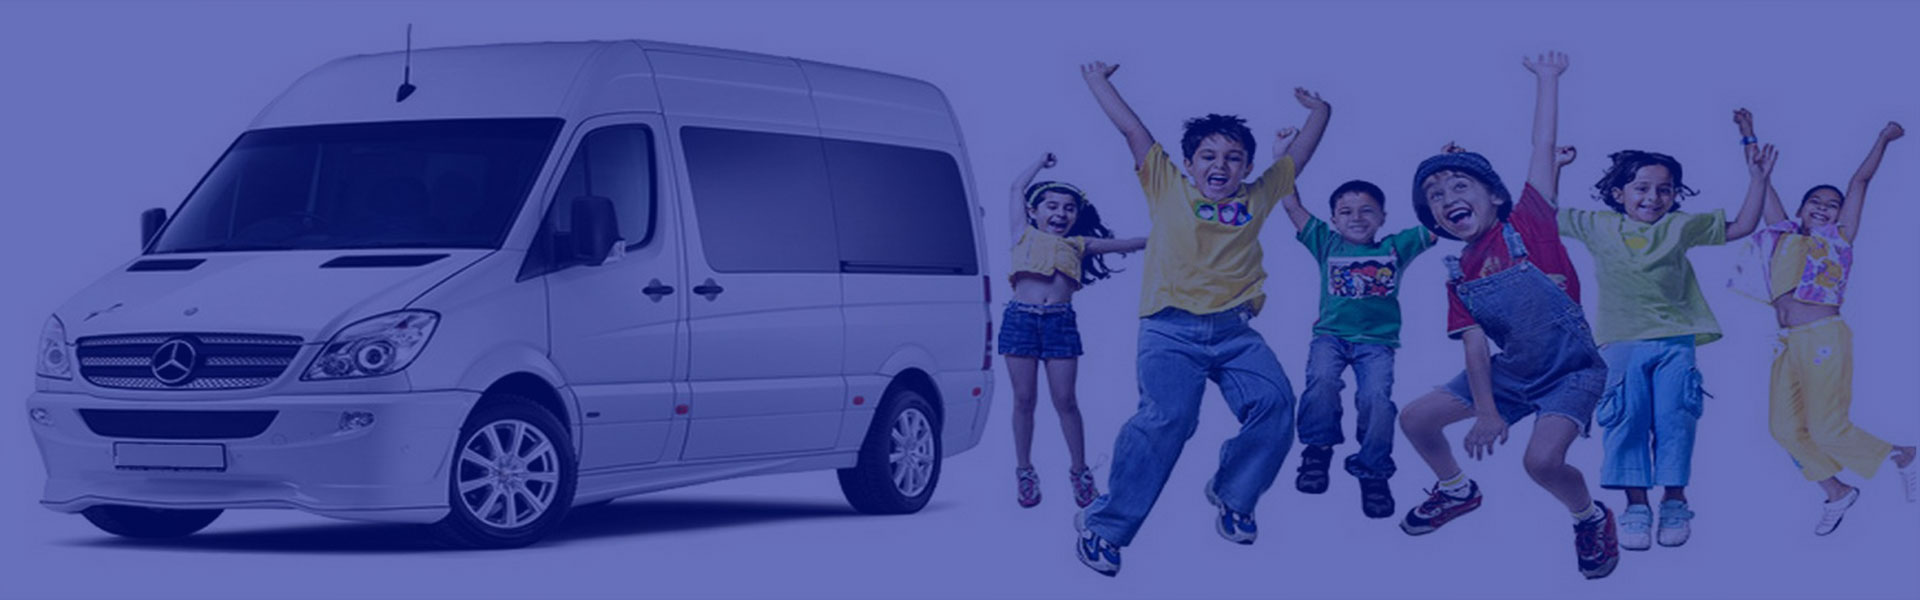 Bursa servis taşımacılığı - Eç turizm